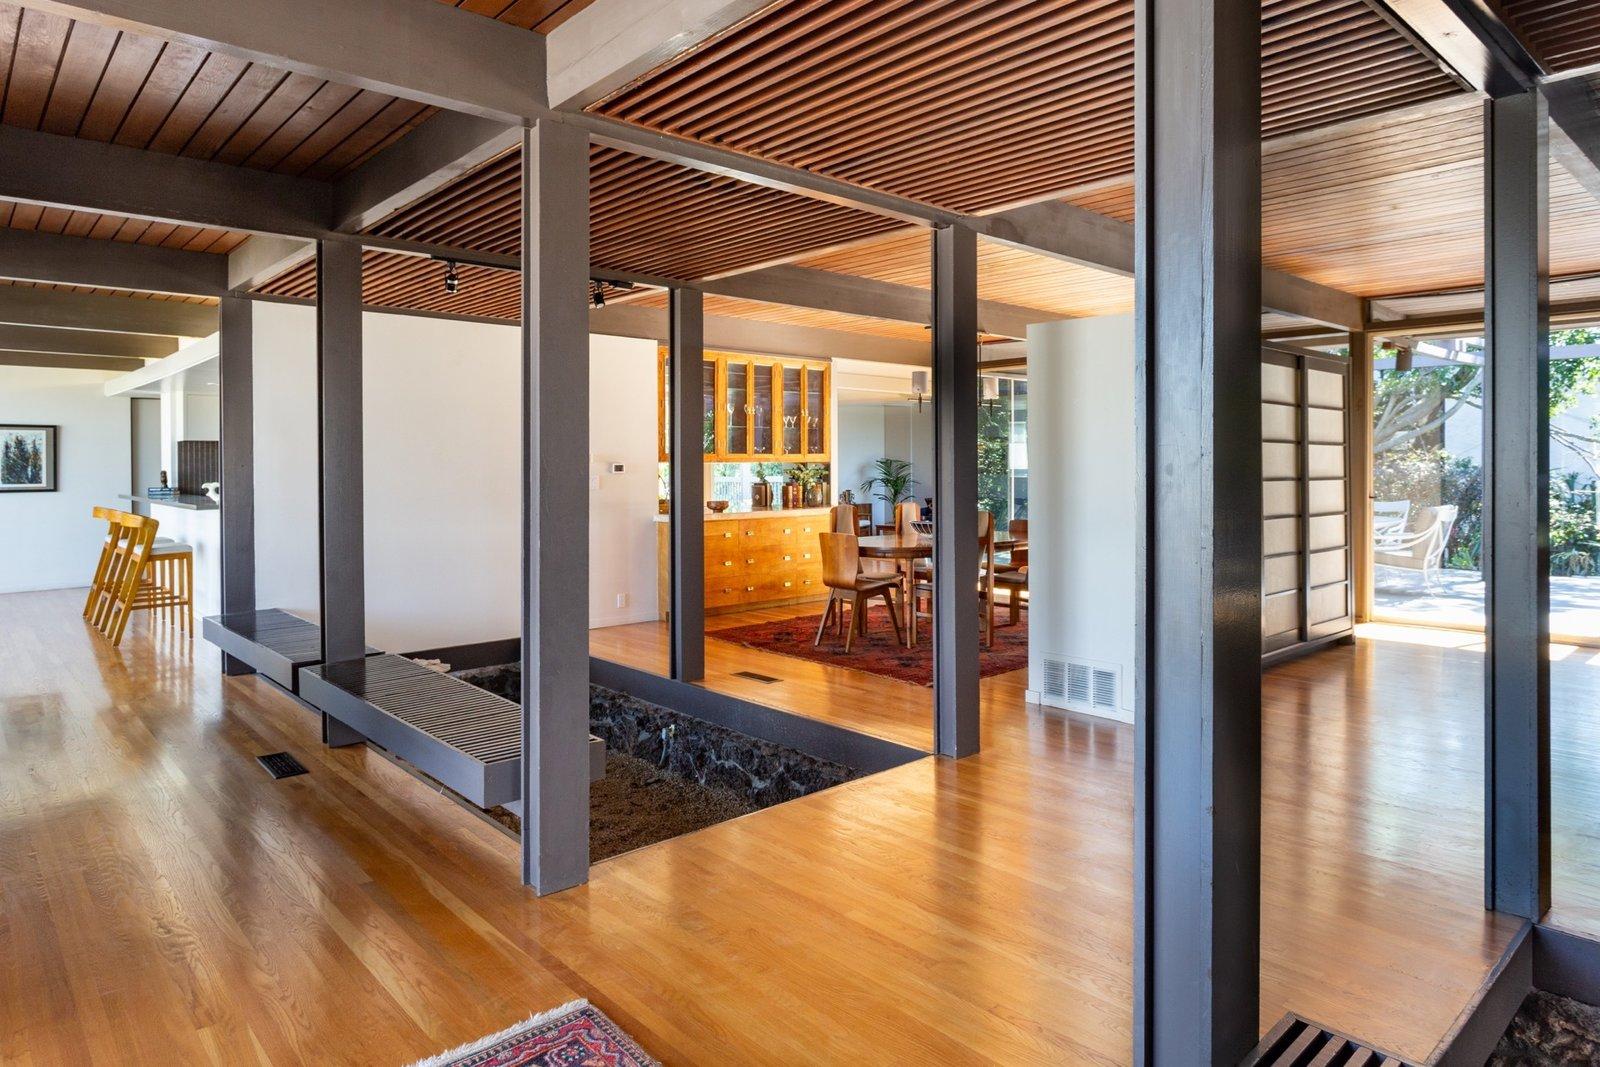 Yuen Residence interior